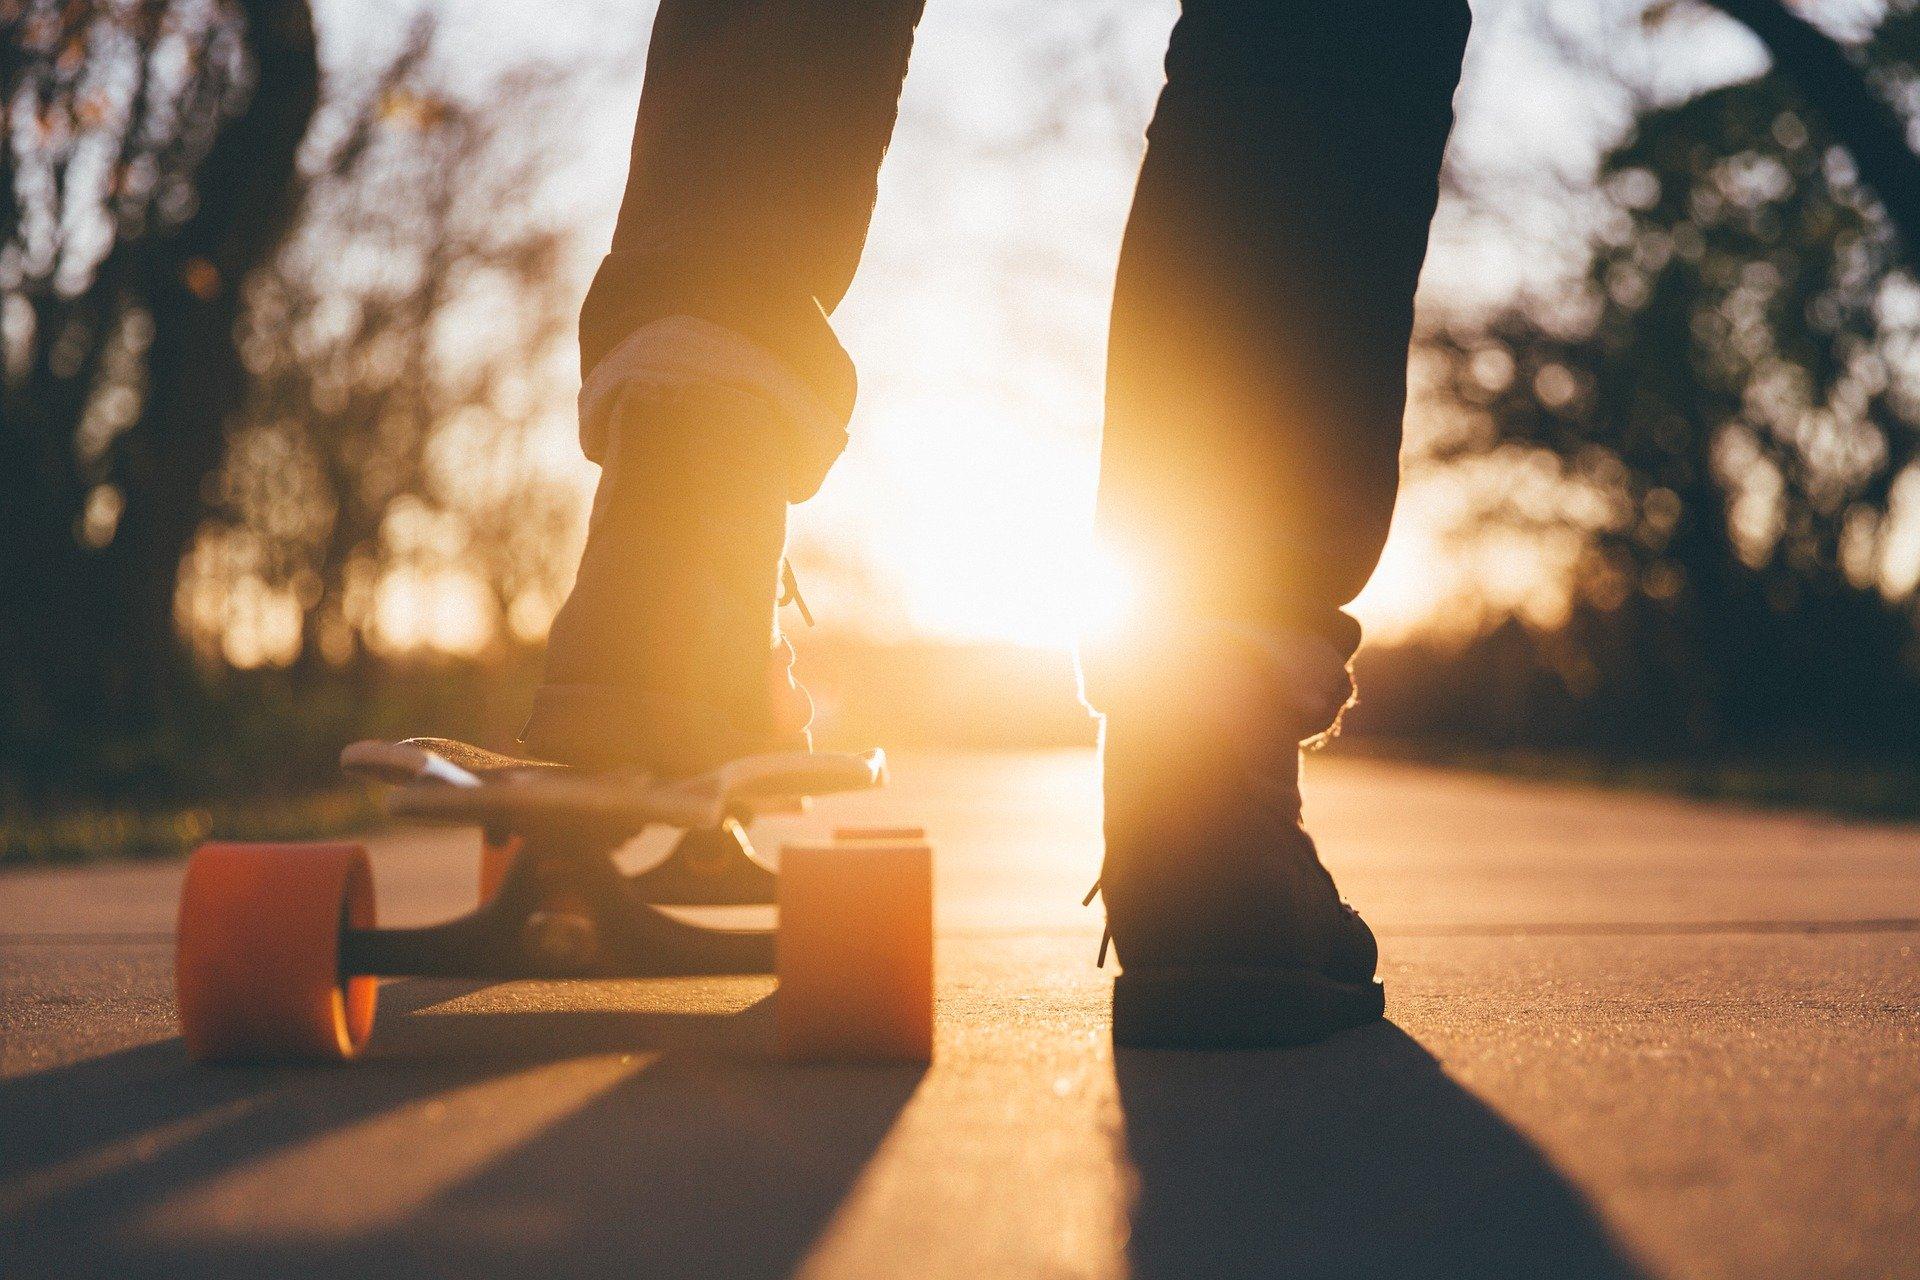 skateboard-1869727_1920